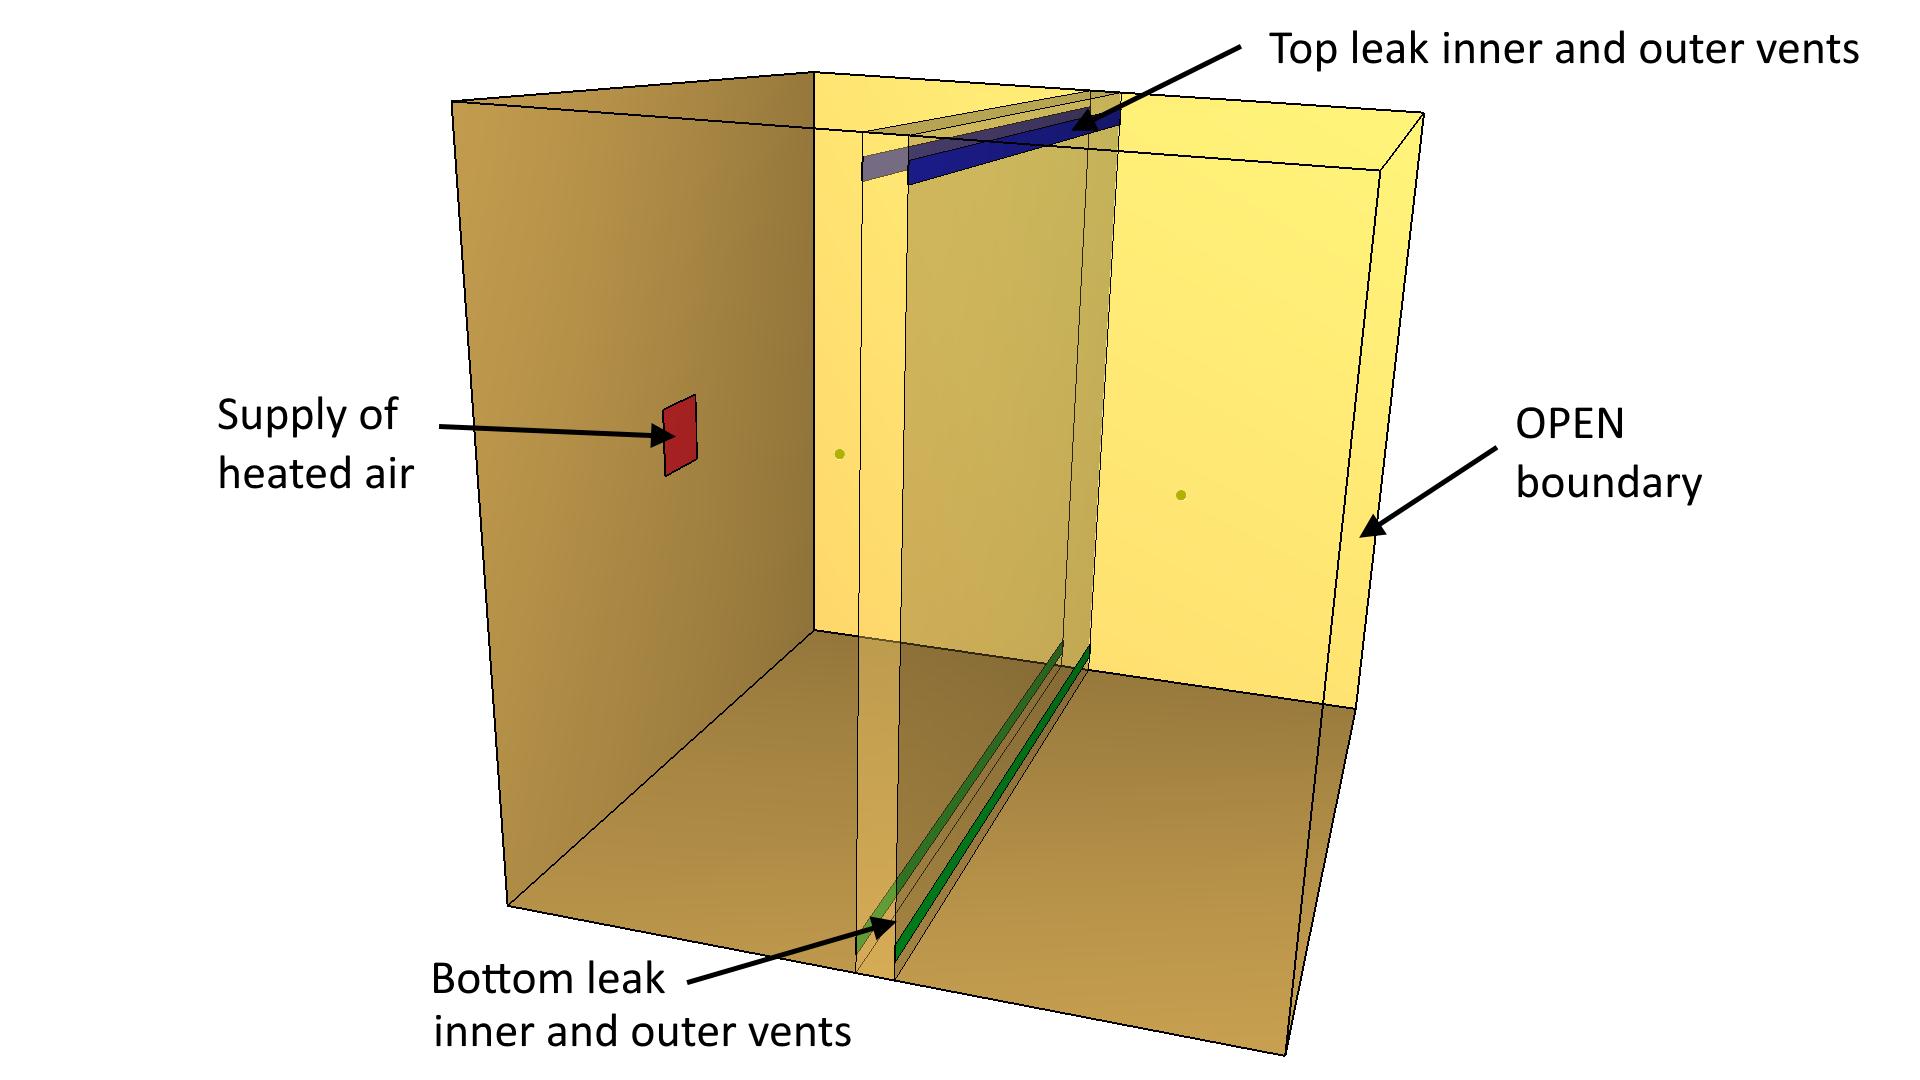 pyro scrn leakage local leakage model